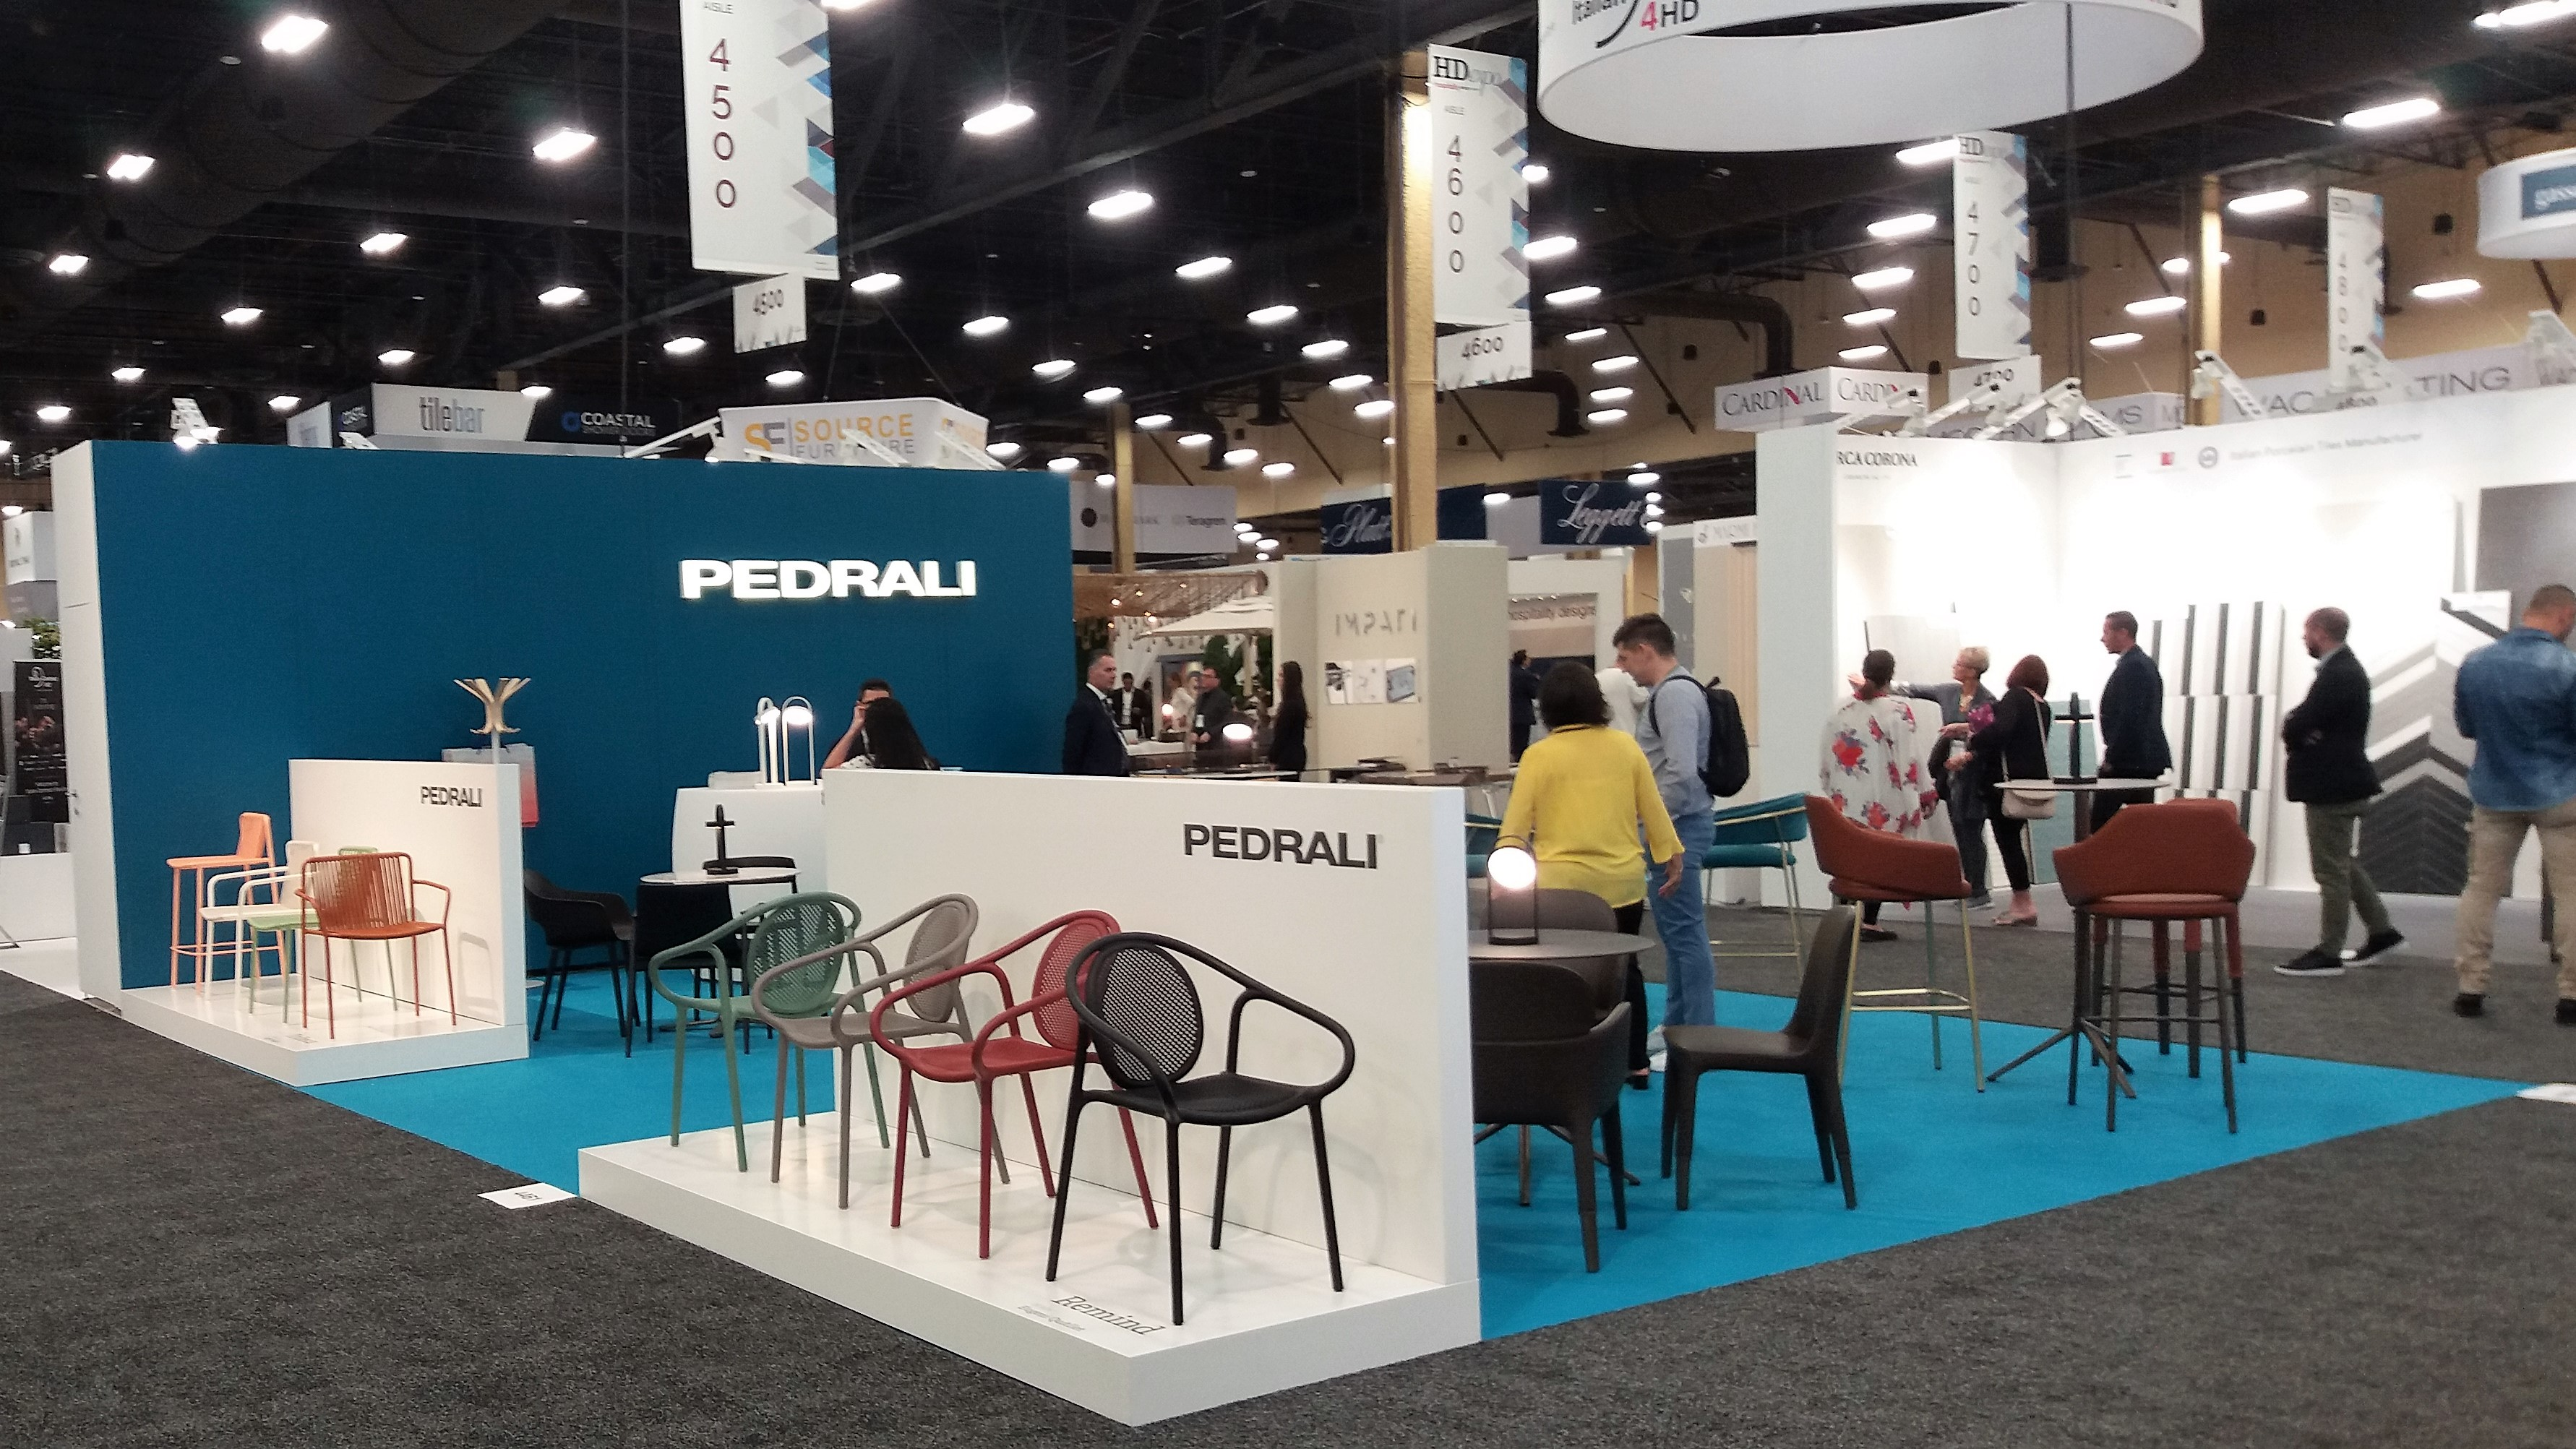 PEDRALI - Hospitality Design Expo